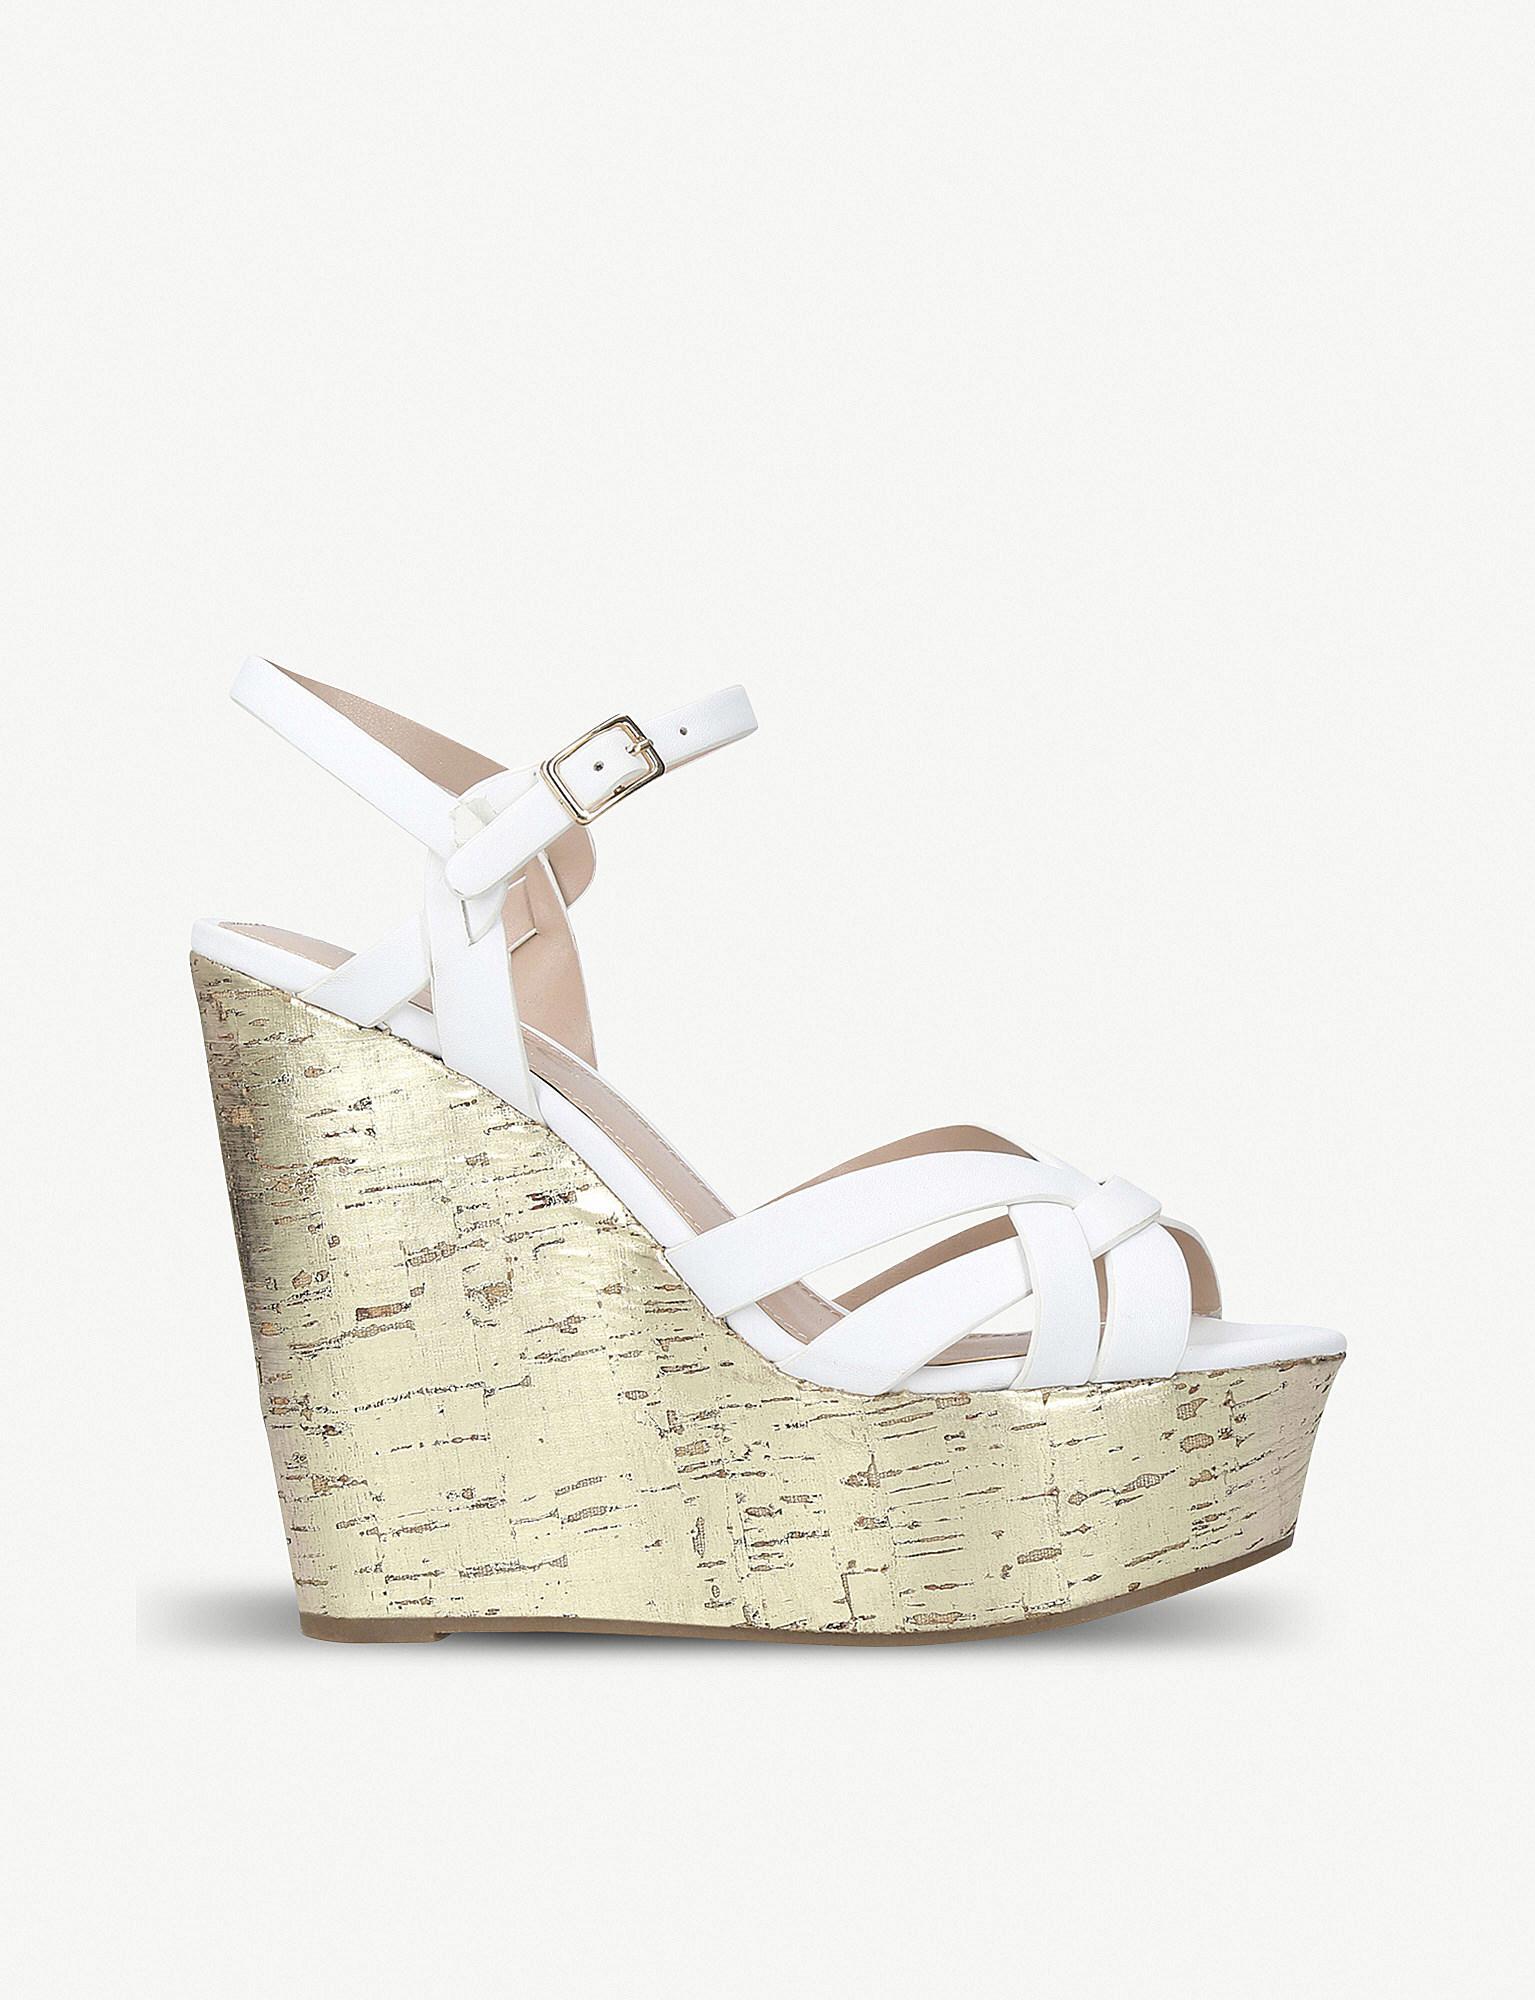 bacb6bb11f2 Lyst - Miss Kg Kabby High Heel Wedge Sandal in White